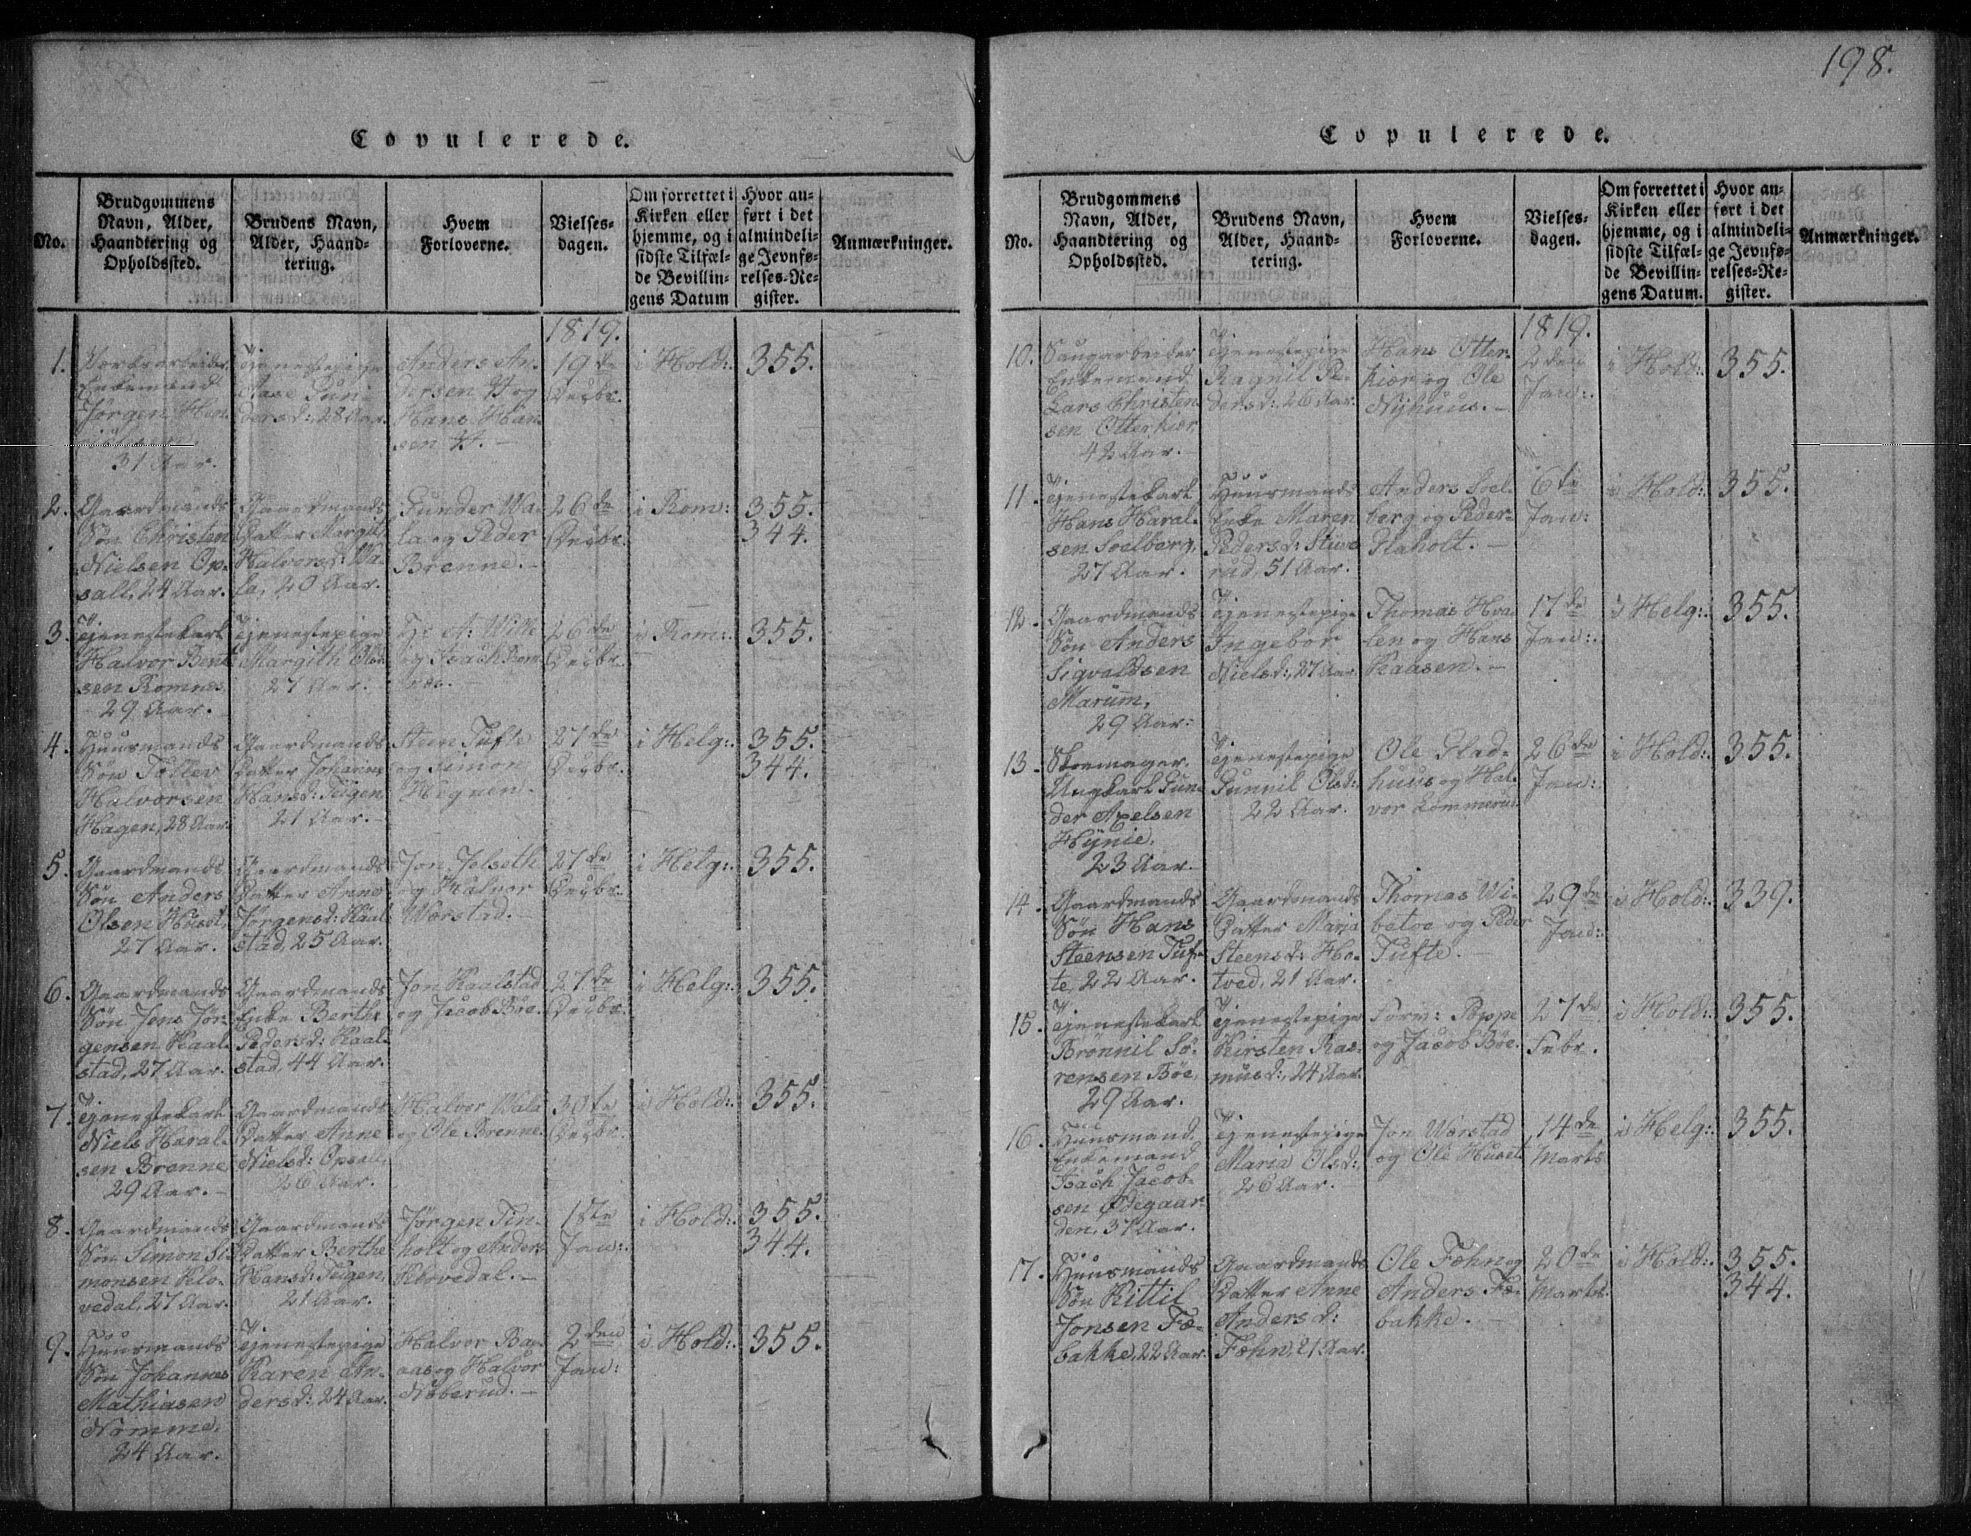 SAKO, Holla kirkebøker, F/Fa/L0003: Ministerialbok nr. 3, 1815-1830, s. 198